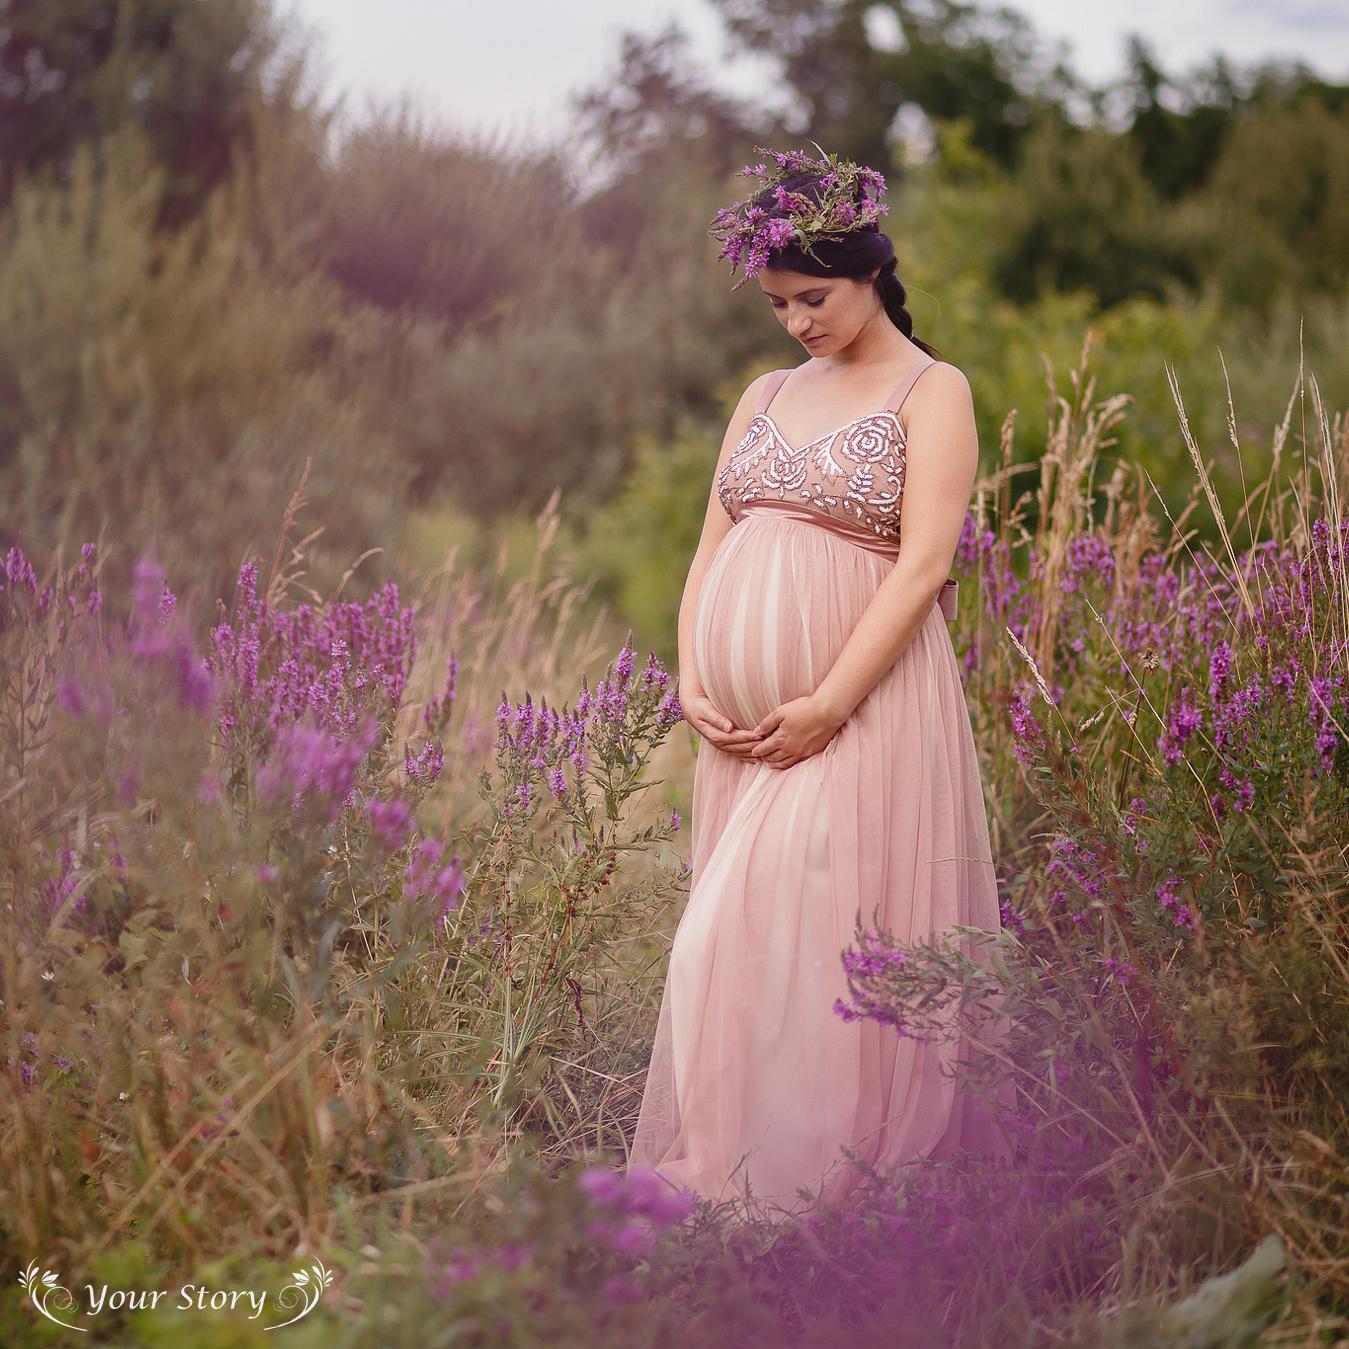 fotografie-maternitate_Your-story-sibiu